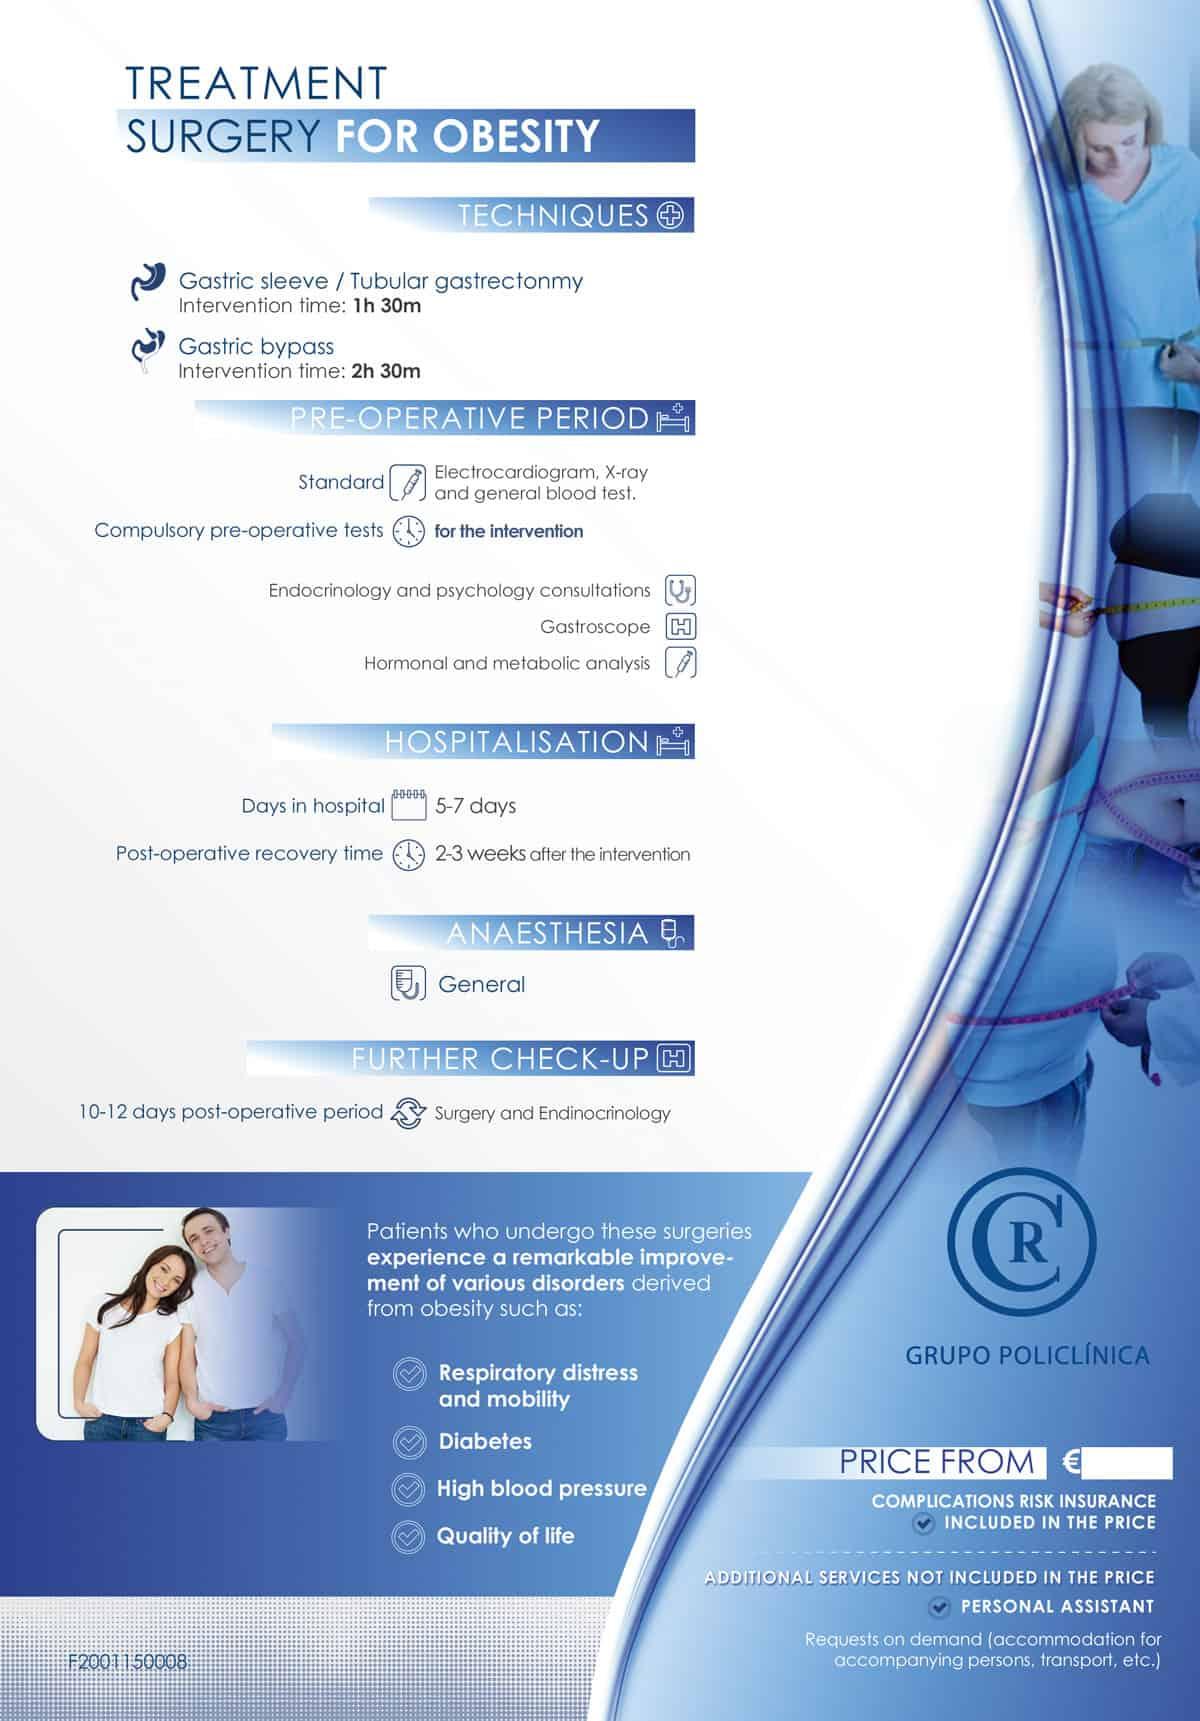 Adipositaschirurgie 1